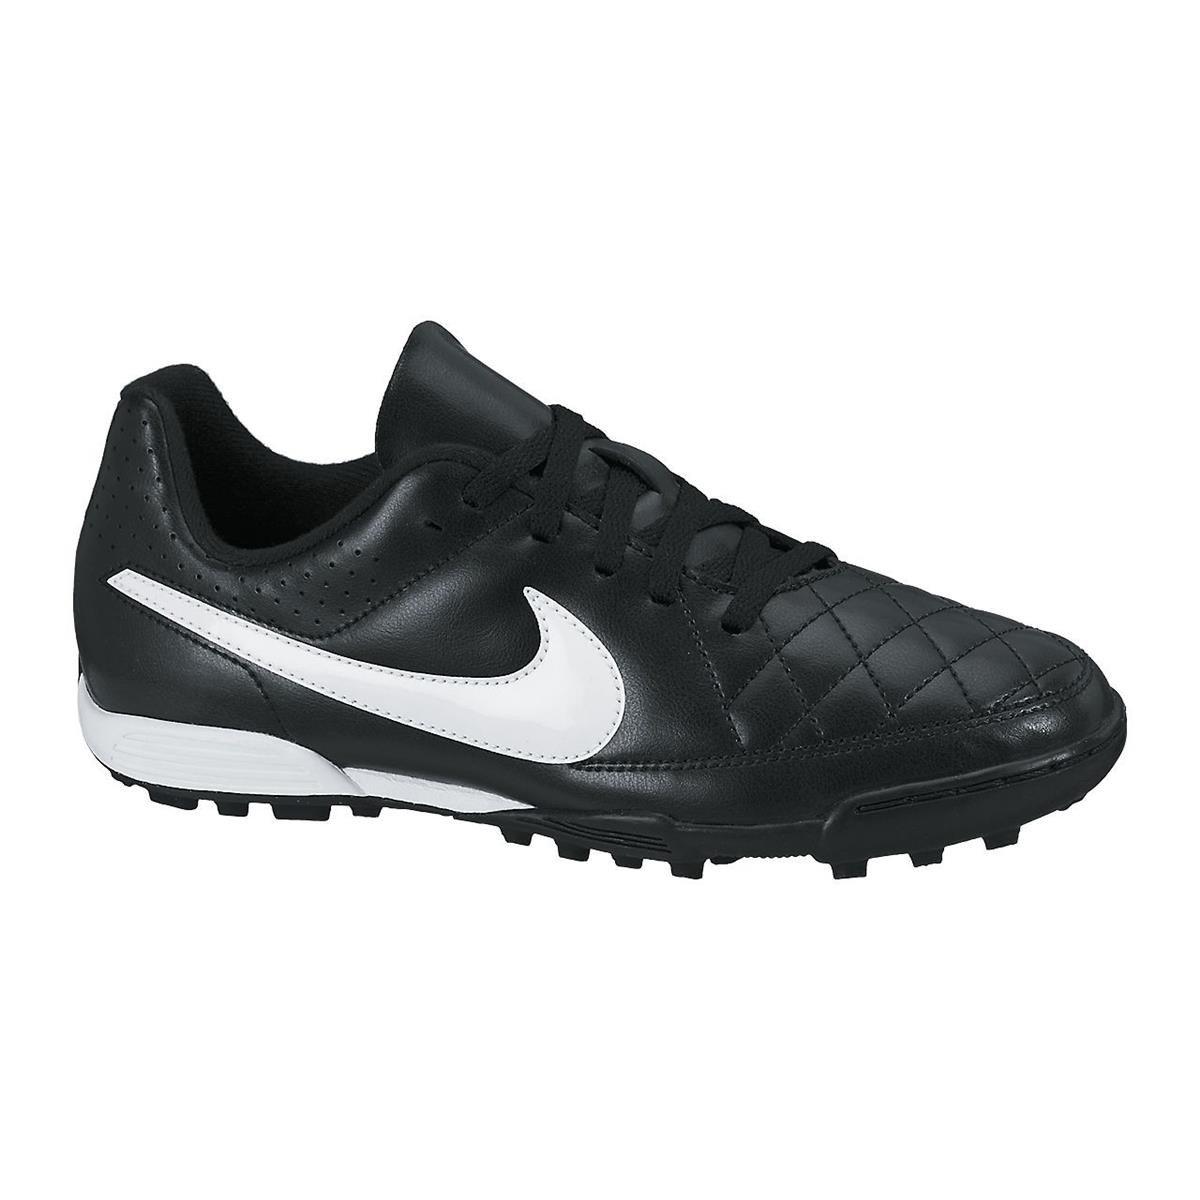 Nike Schuhe Kinder Jr tiempo rio ii TF schwarz Weiß, Größe 5.5Y